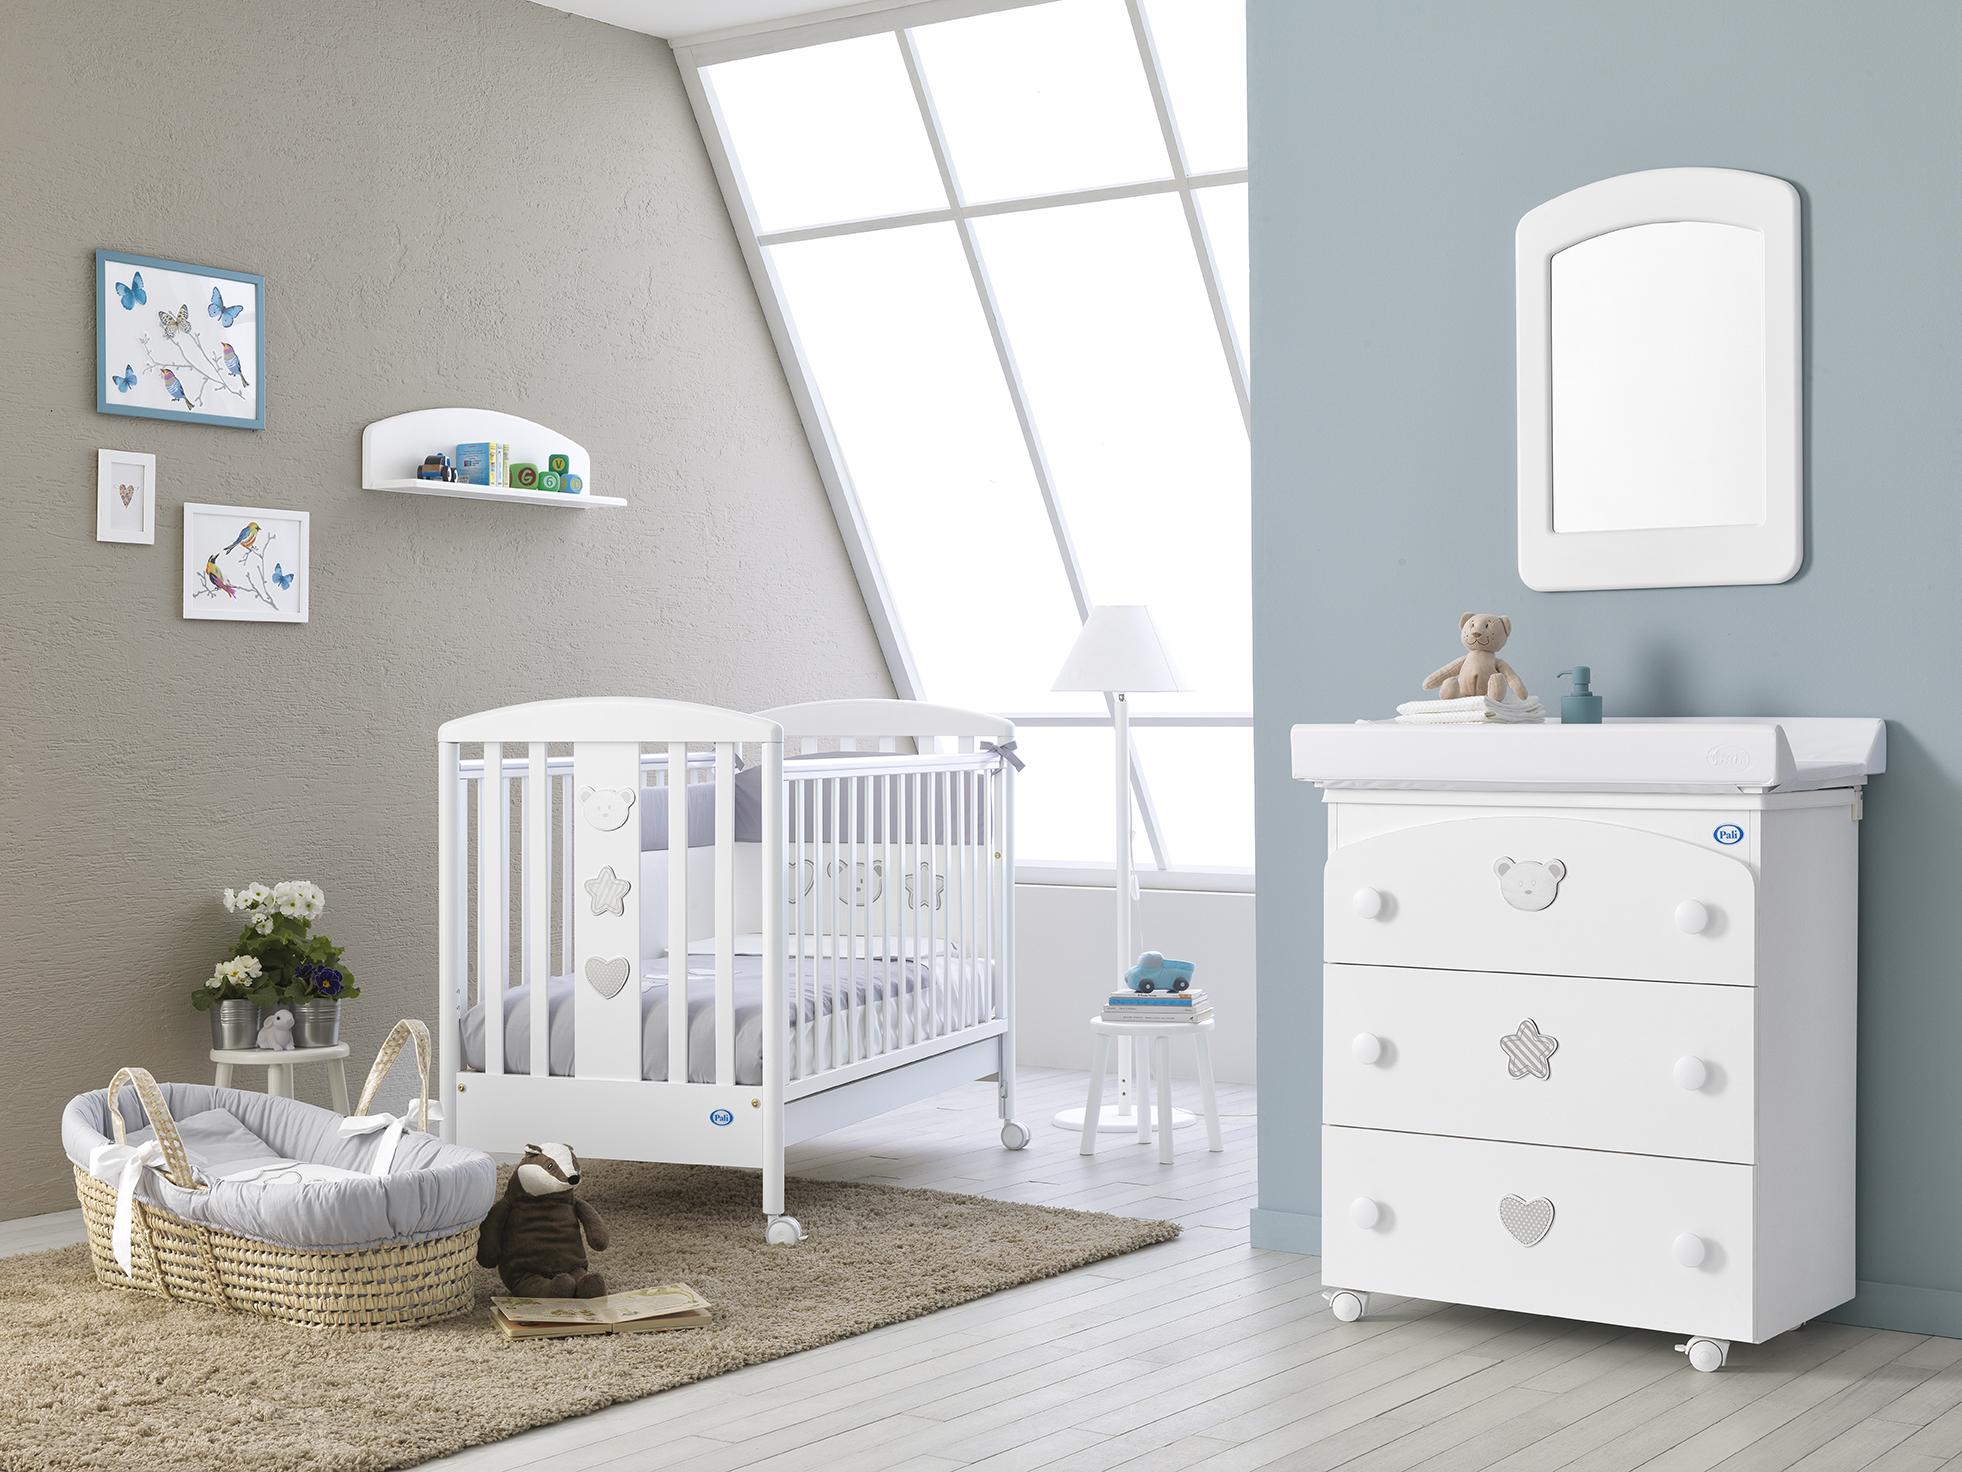 ac269a3fa37 Ολοκληρωμένο βρεφικό δωμάτιo PALI Birillo white με συρταριέρα-μπανάκι-αλλαξιέρα,  προίκα και στρώμα :: PaliBaby